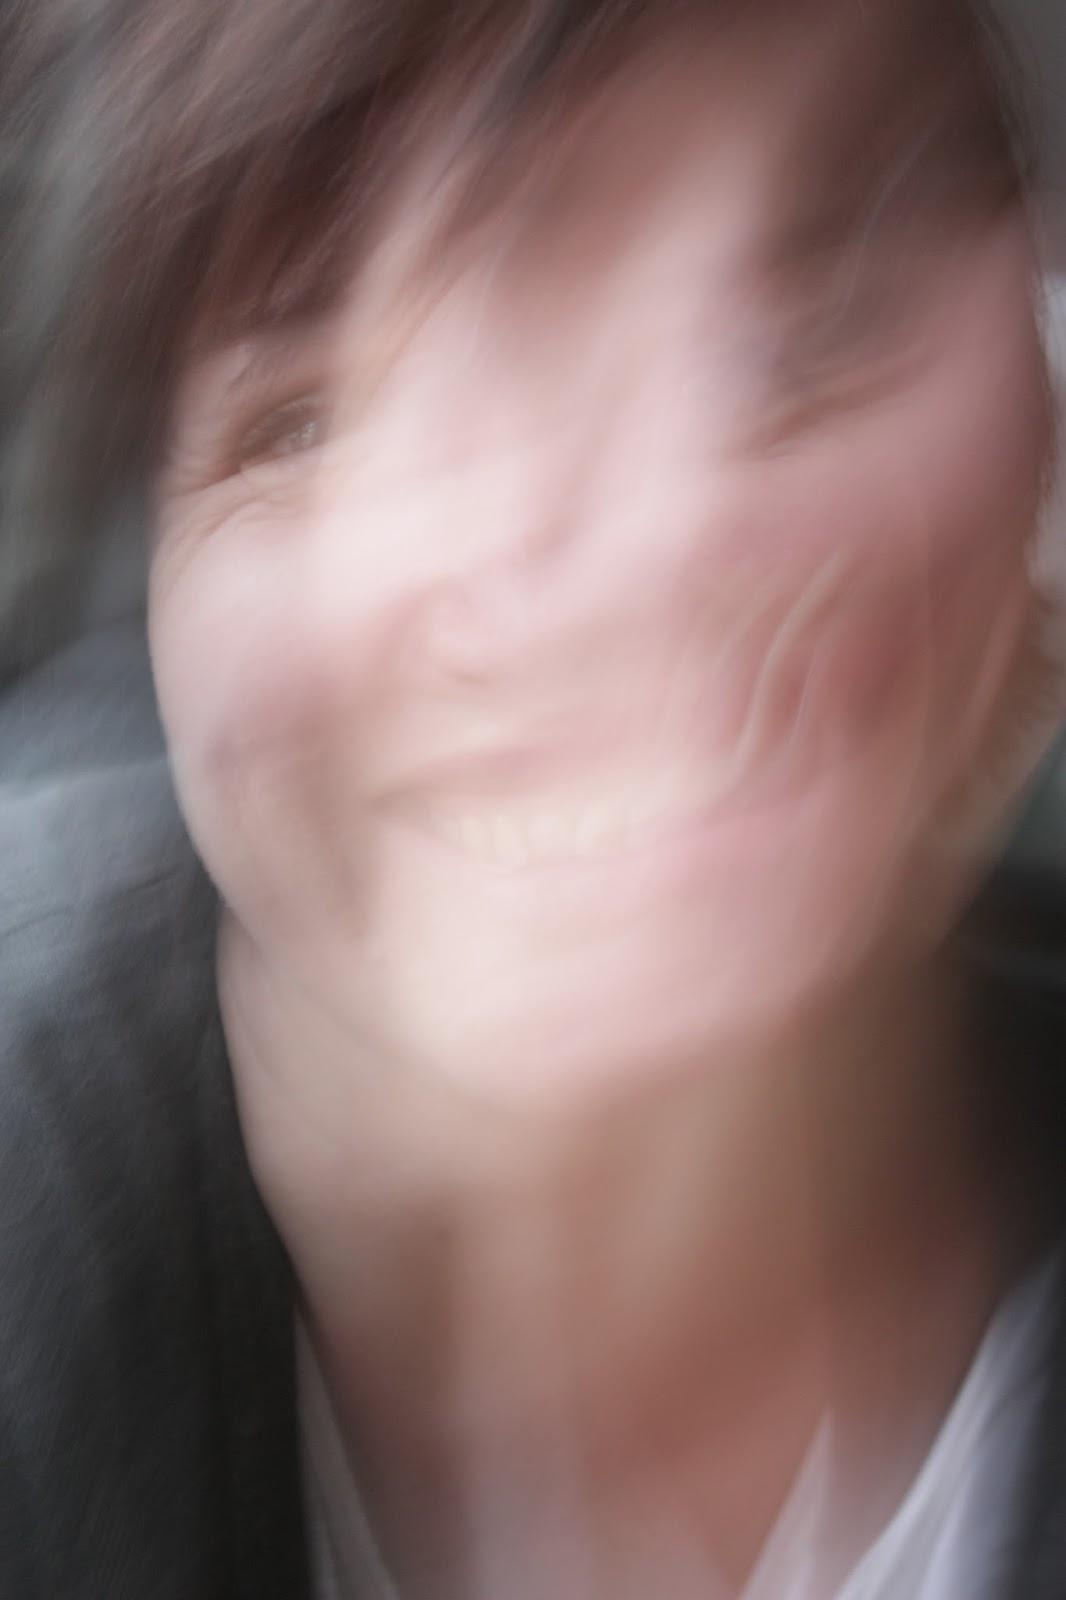 panoseuraa oma kuva pimppi